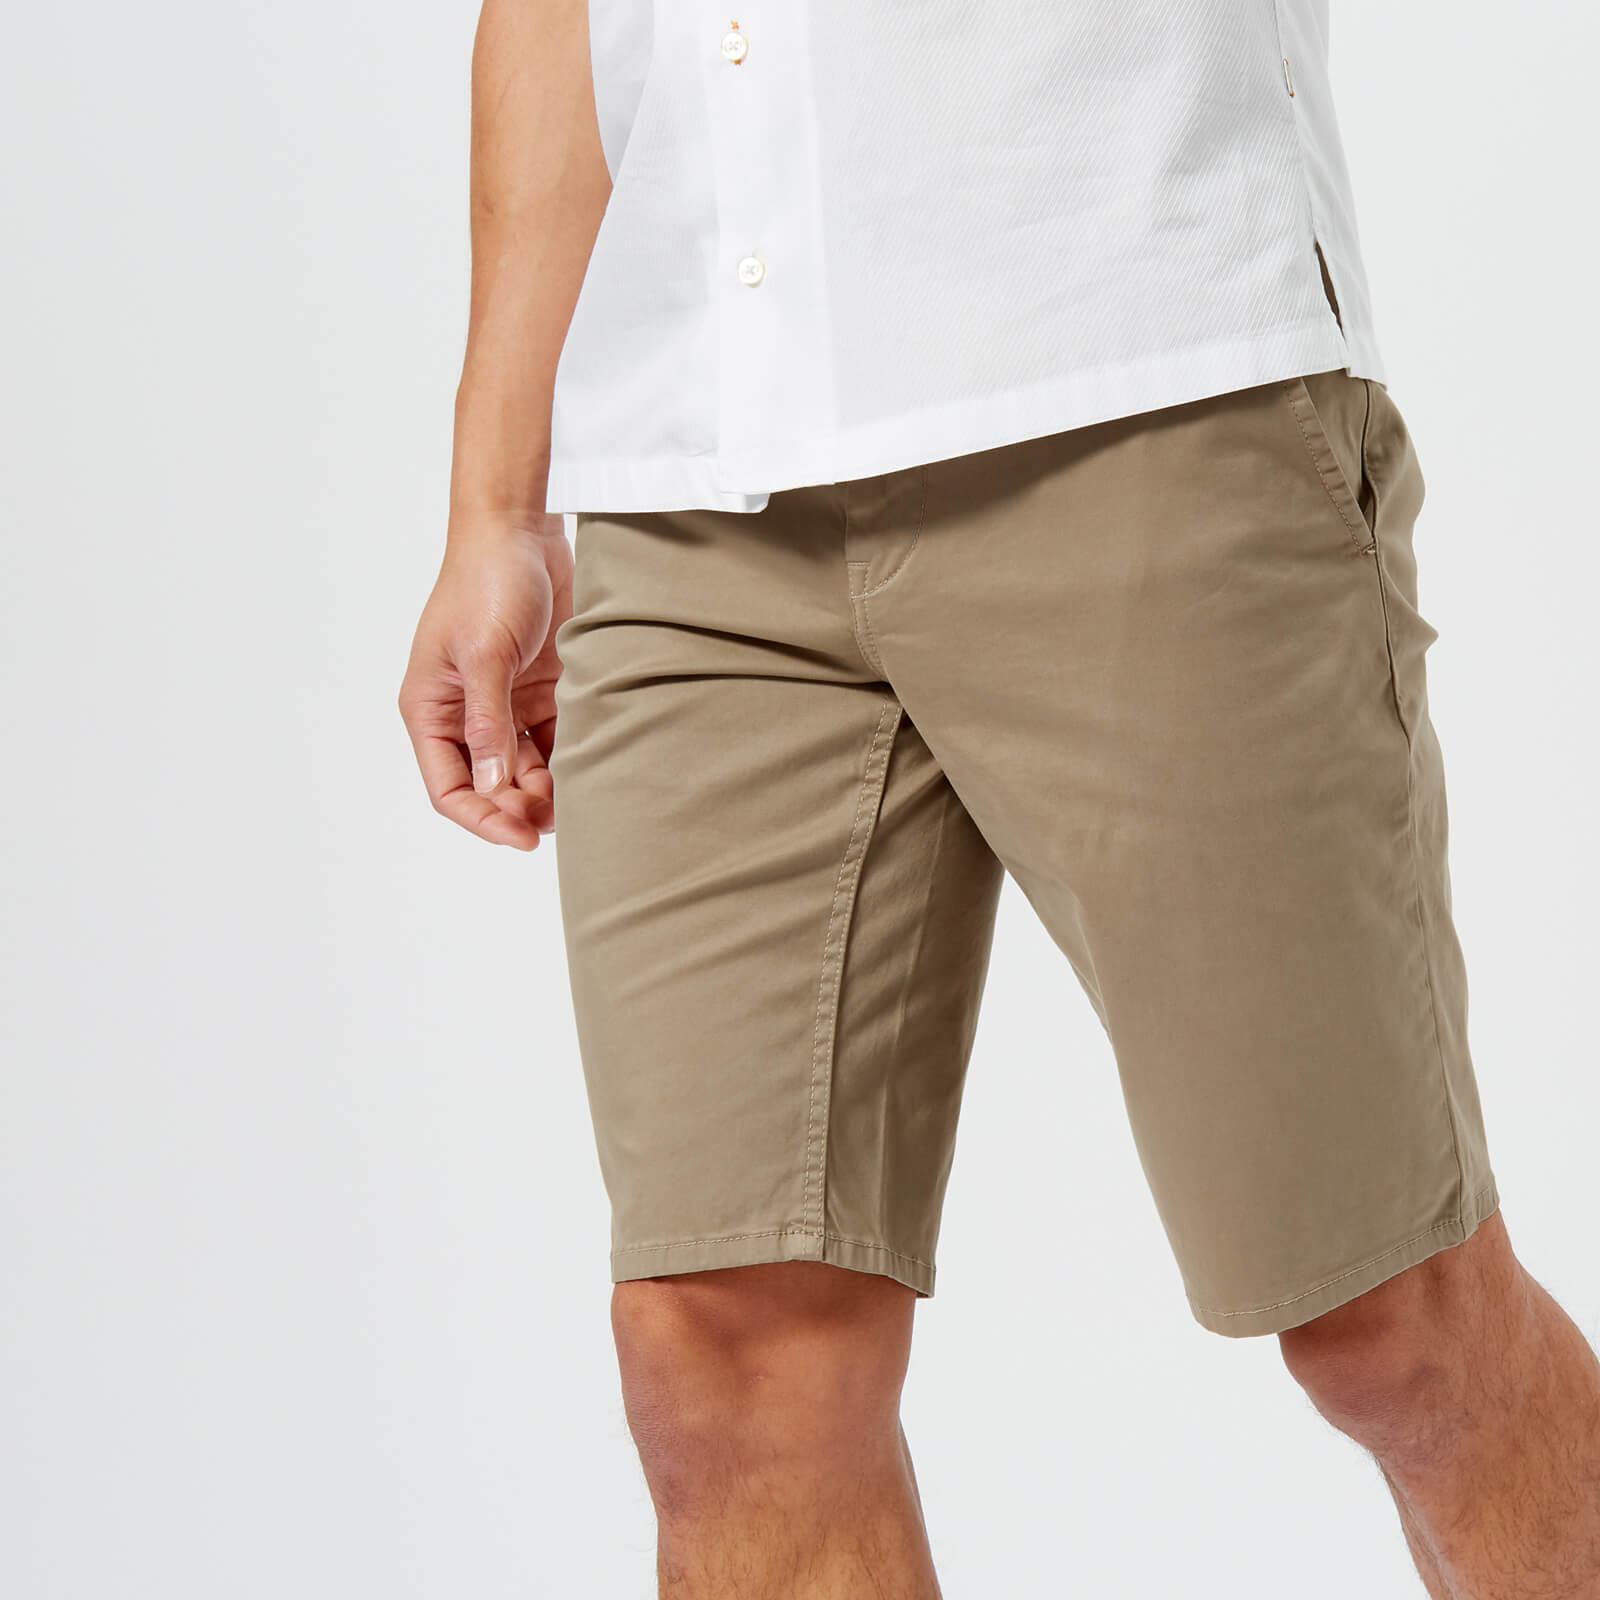 174add139 BOSS Orange Men's Schino Slim Shorts - Beige Mens Clothing   TheHut.com